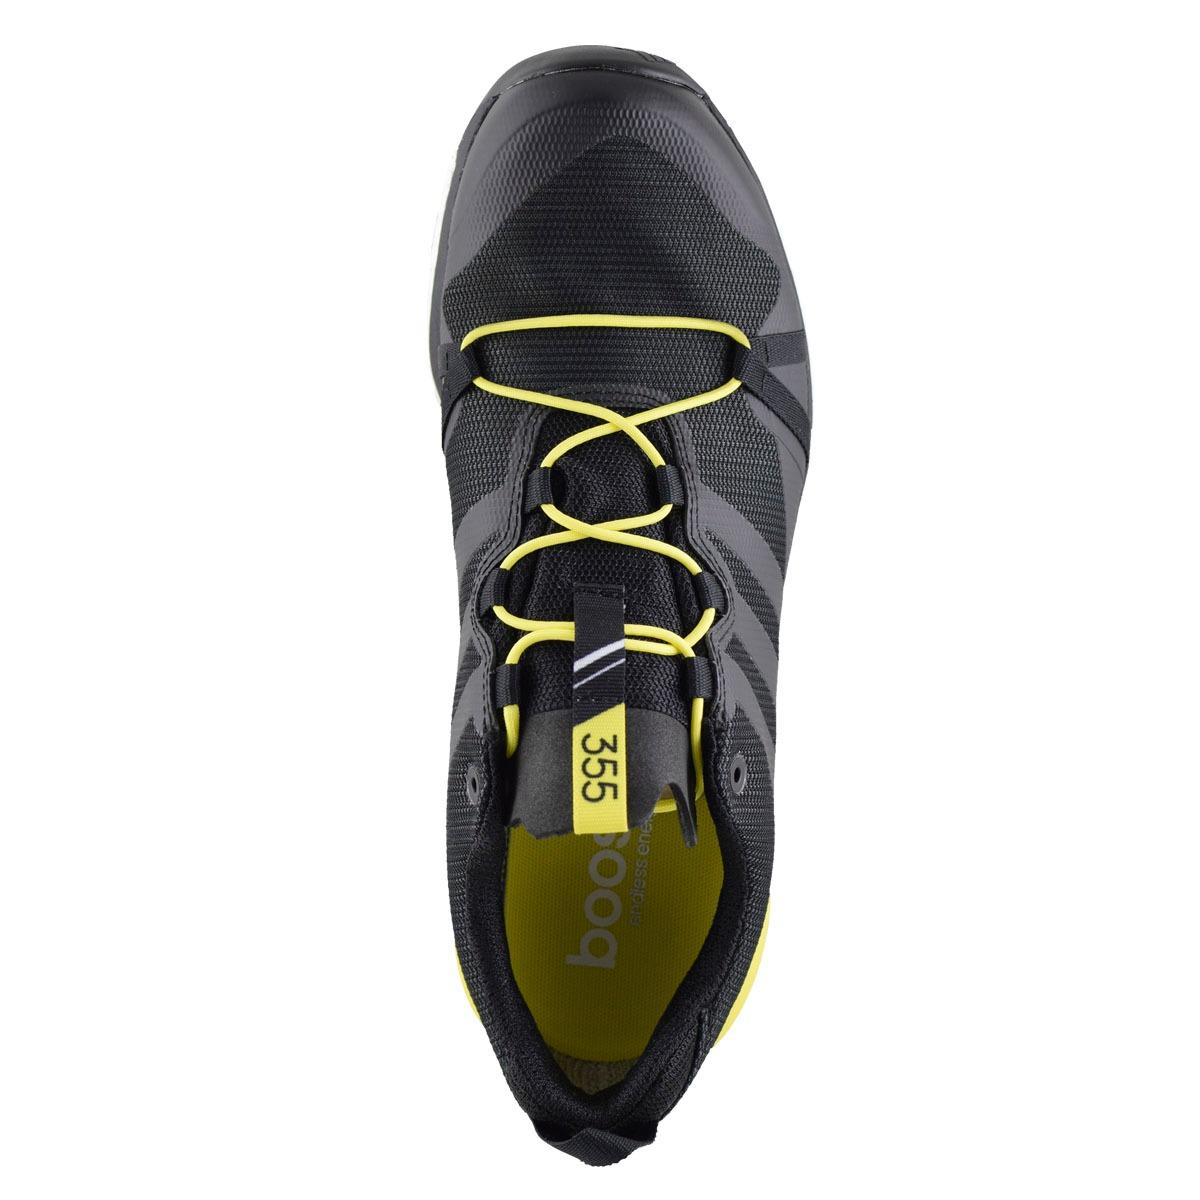 quality design 9b6f0 39bc4 zapatillas adidas terrex agravic gtx hombre negro. Cargando zoom.